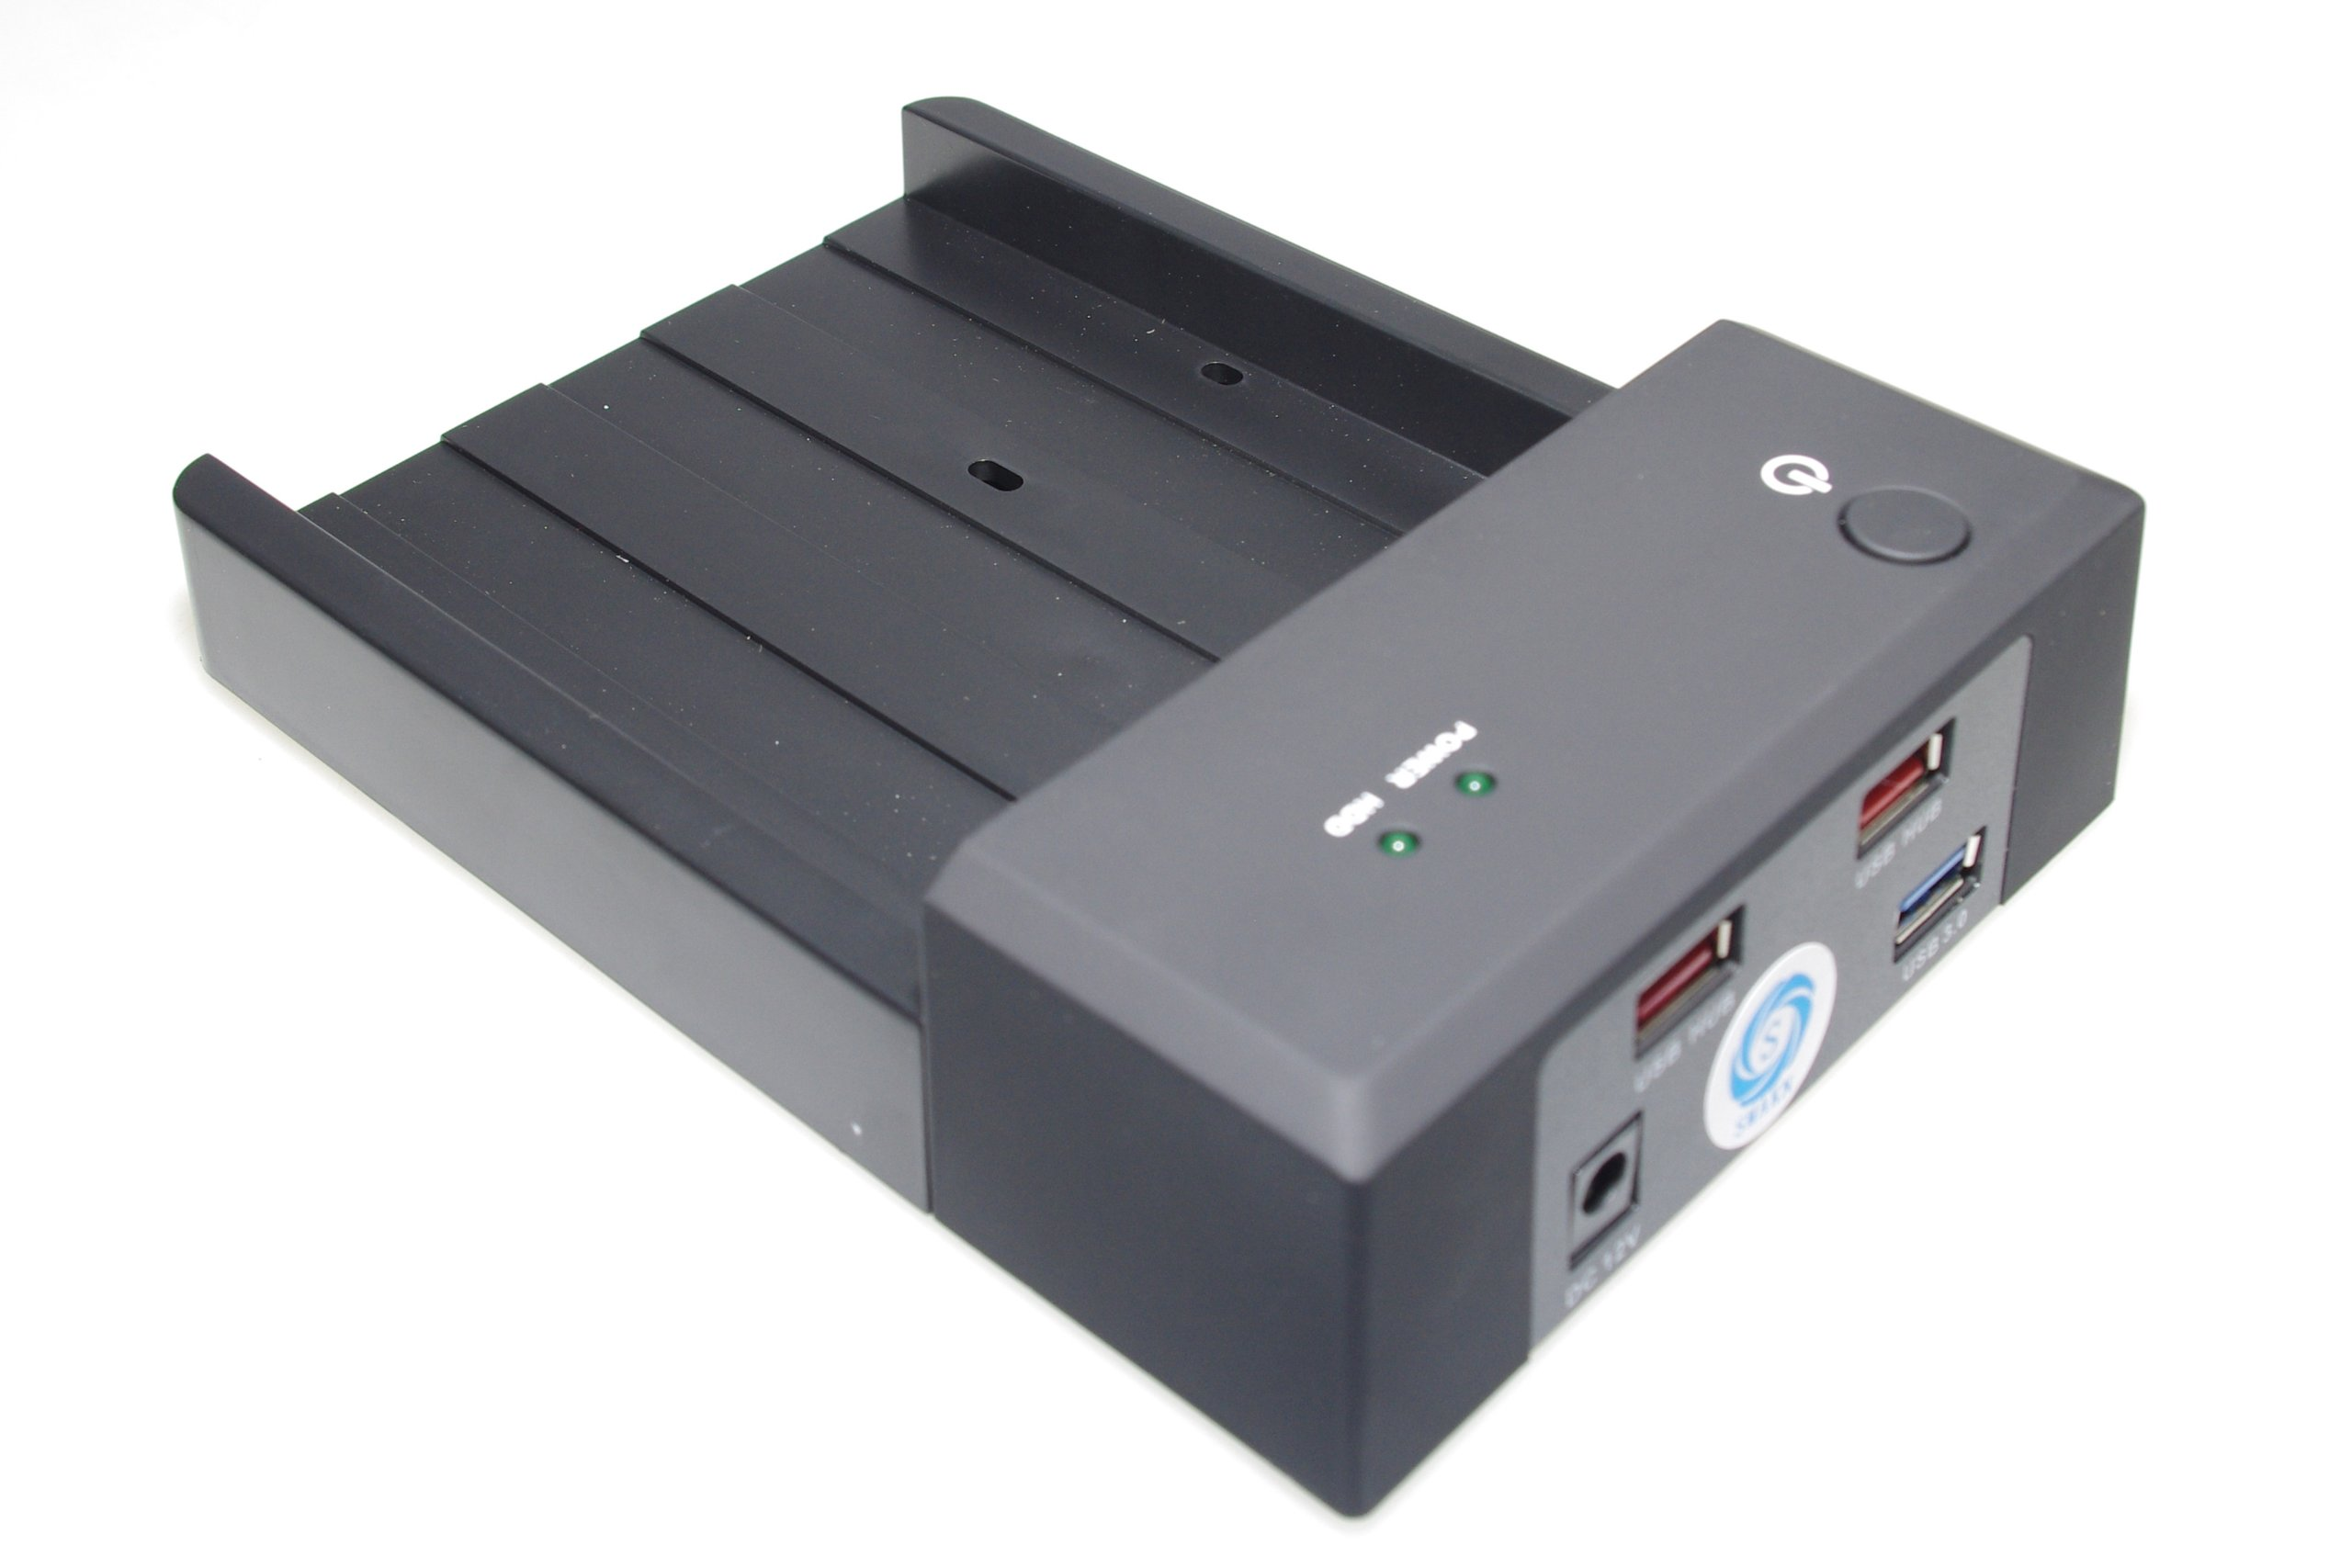 SMAKN® 3.5''/2.5'' SATA HDD To Dual USB 2.0 Port External Dock Station Enclosure